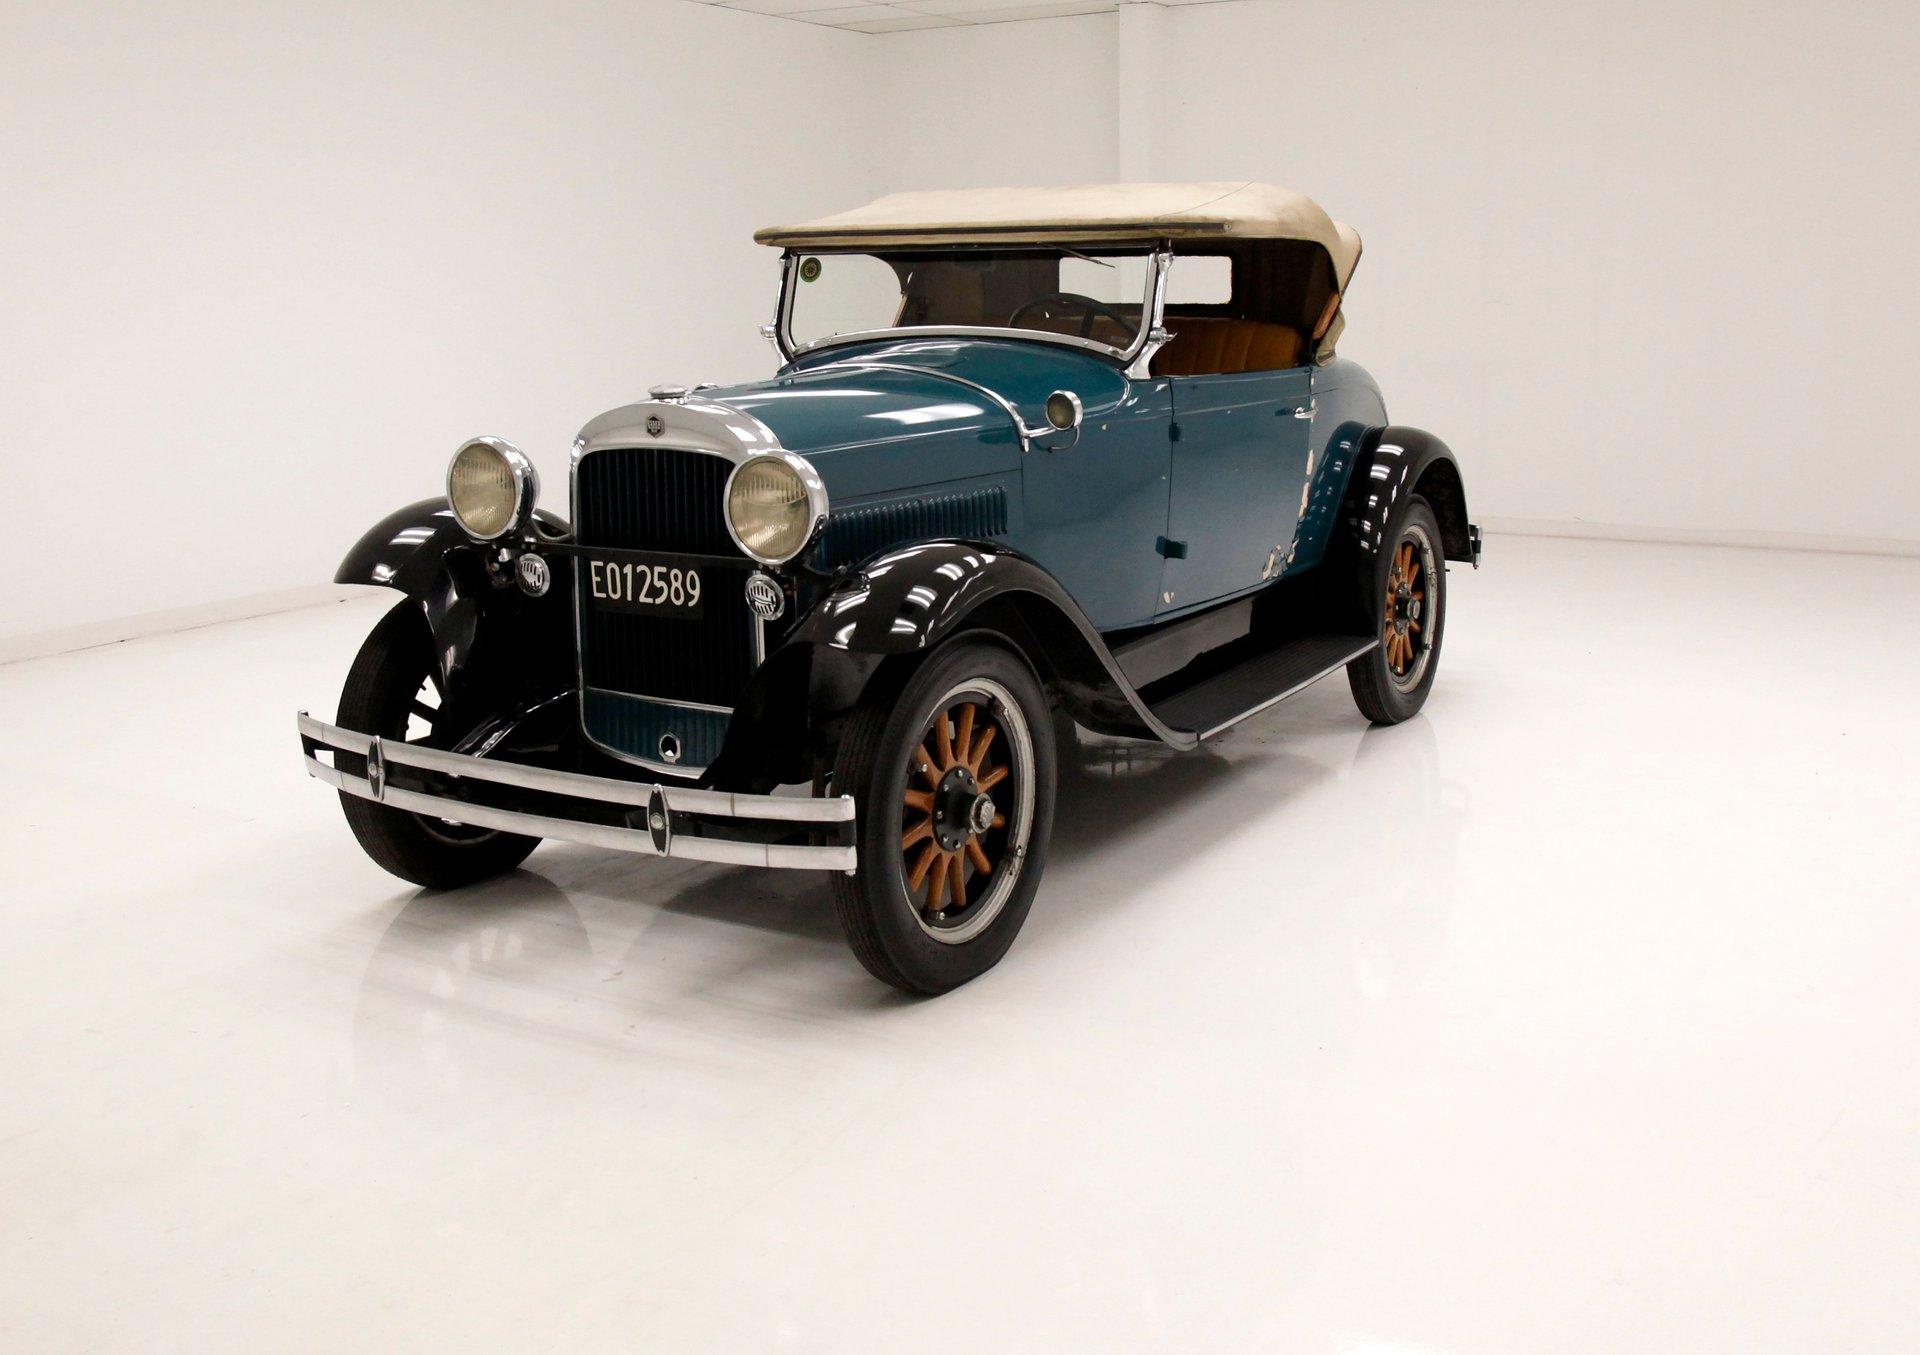 1928 Essex Super Six